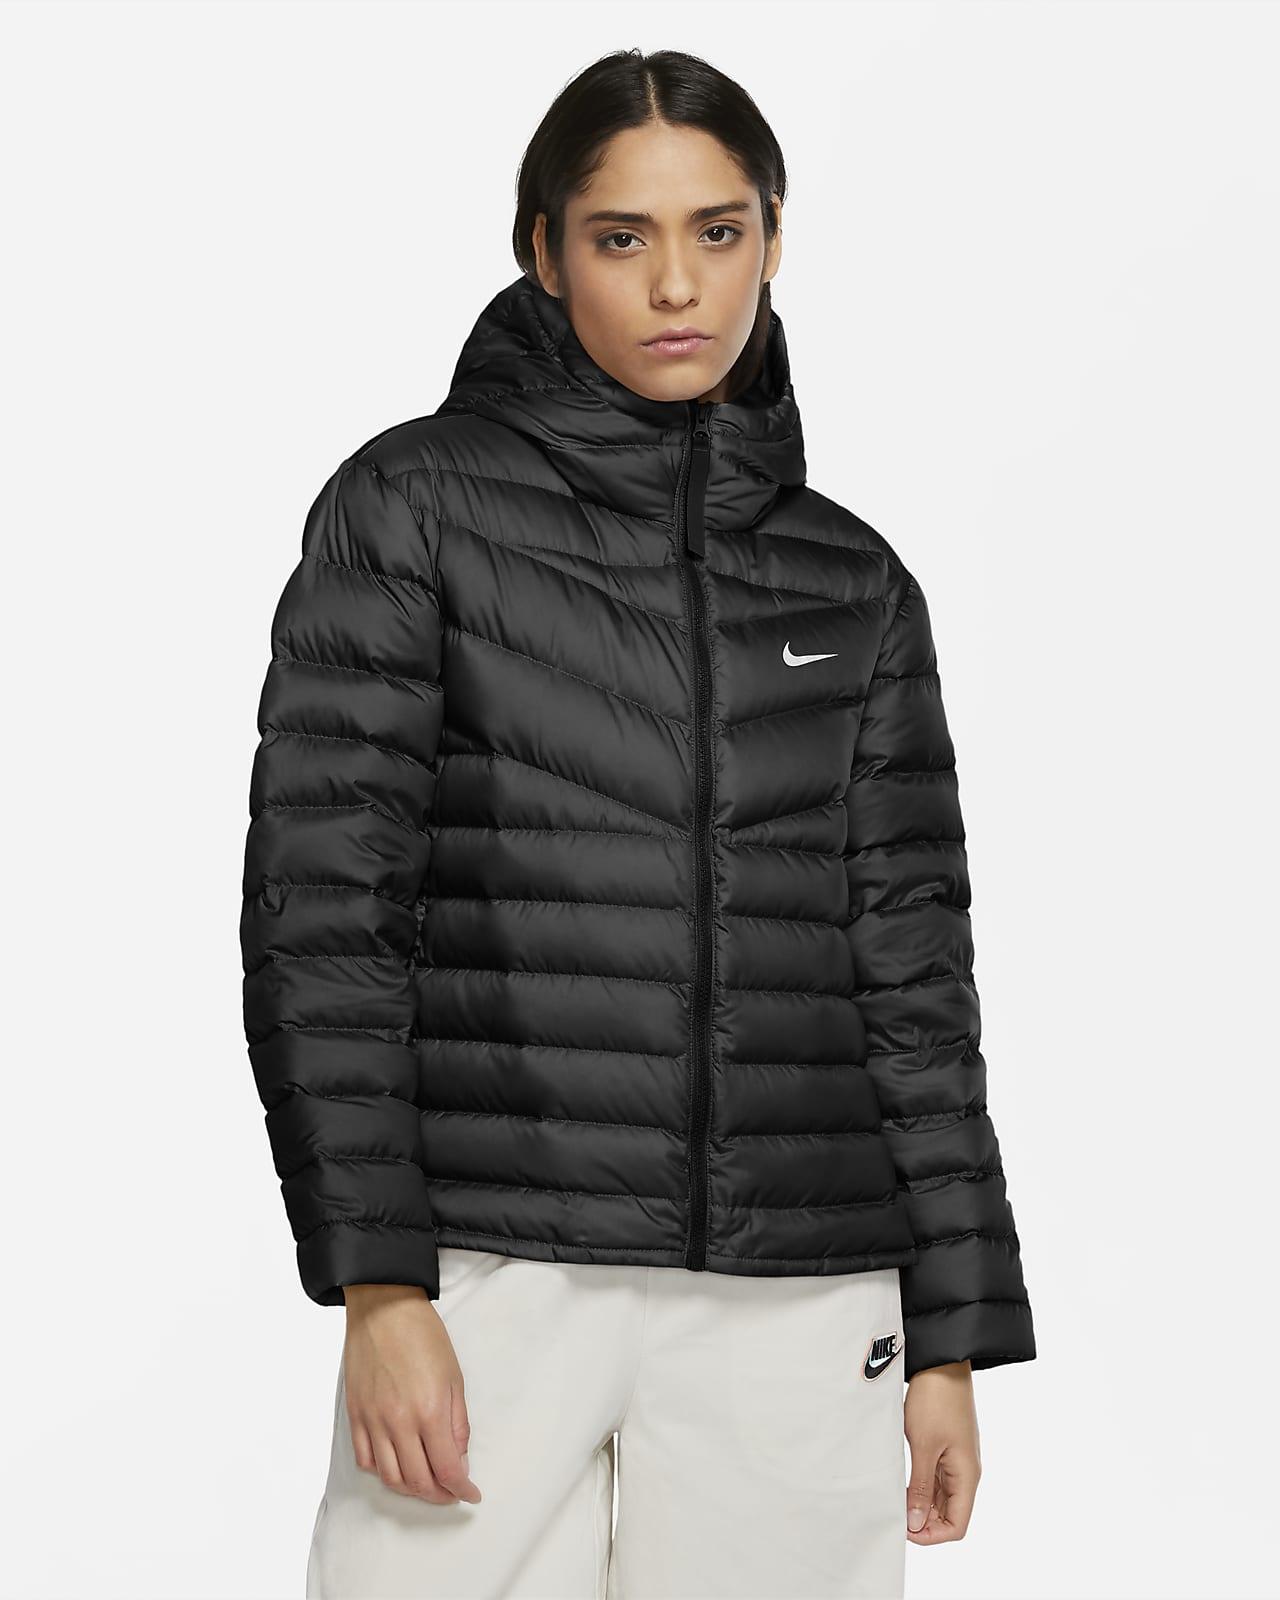 Chamarra de Windrunner para mujer Nike Sportswear Down-Fill